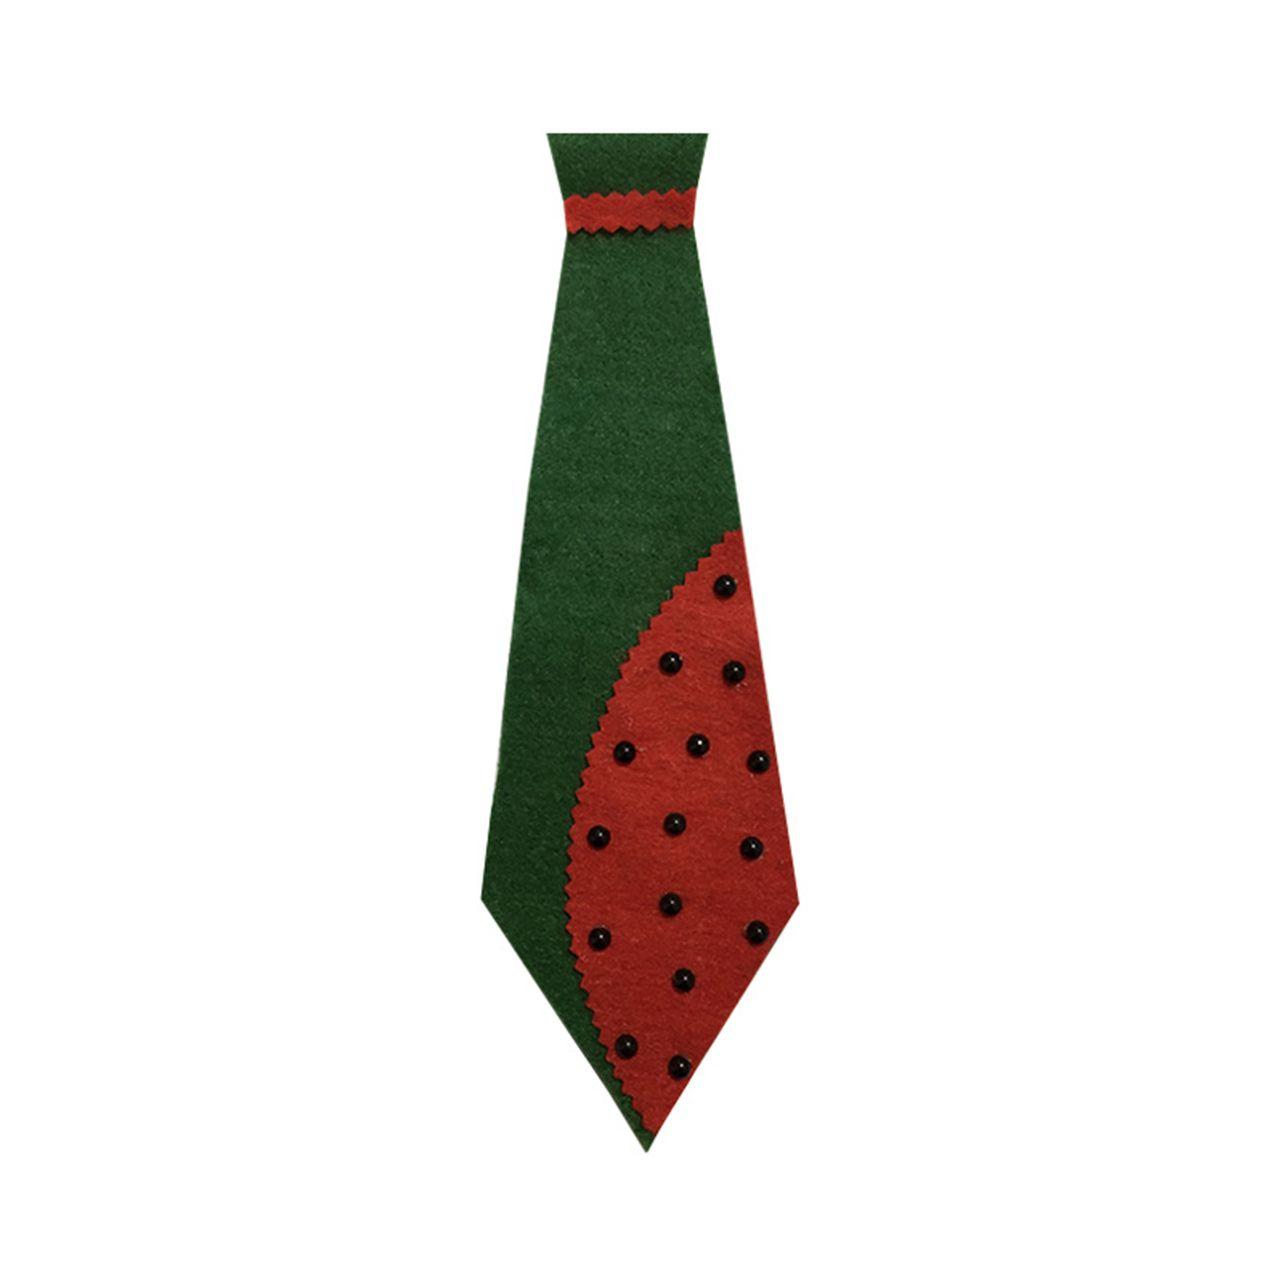 کراوات طرح شب یلدا مدل STY102